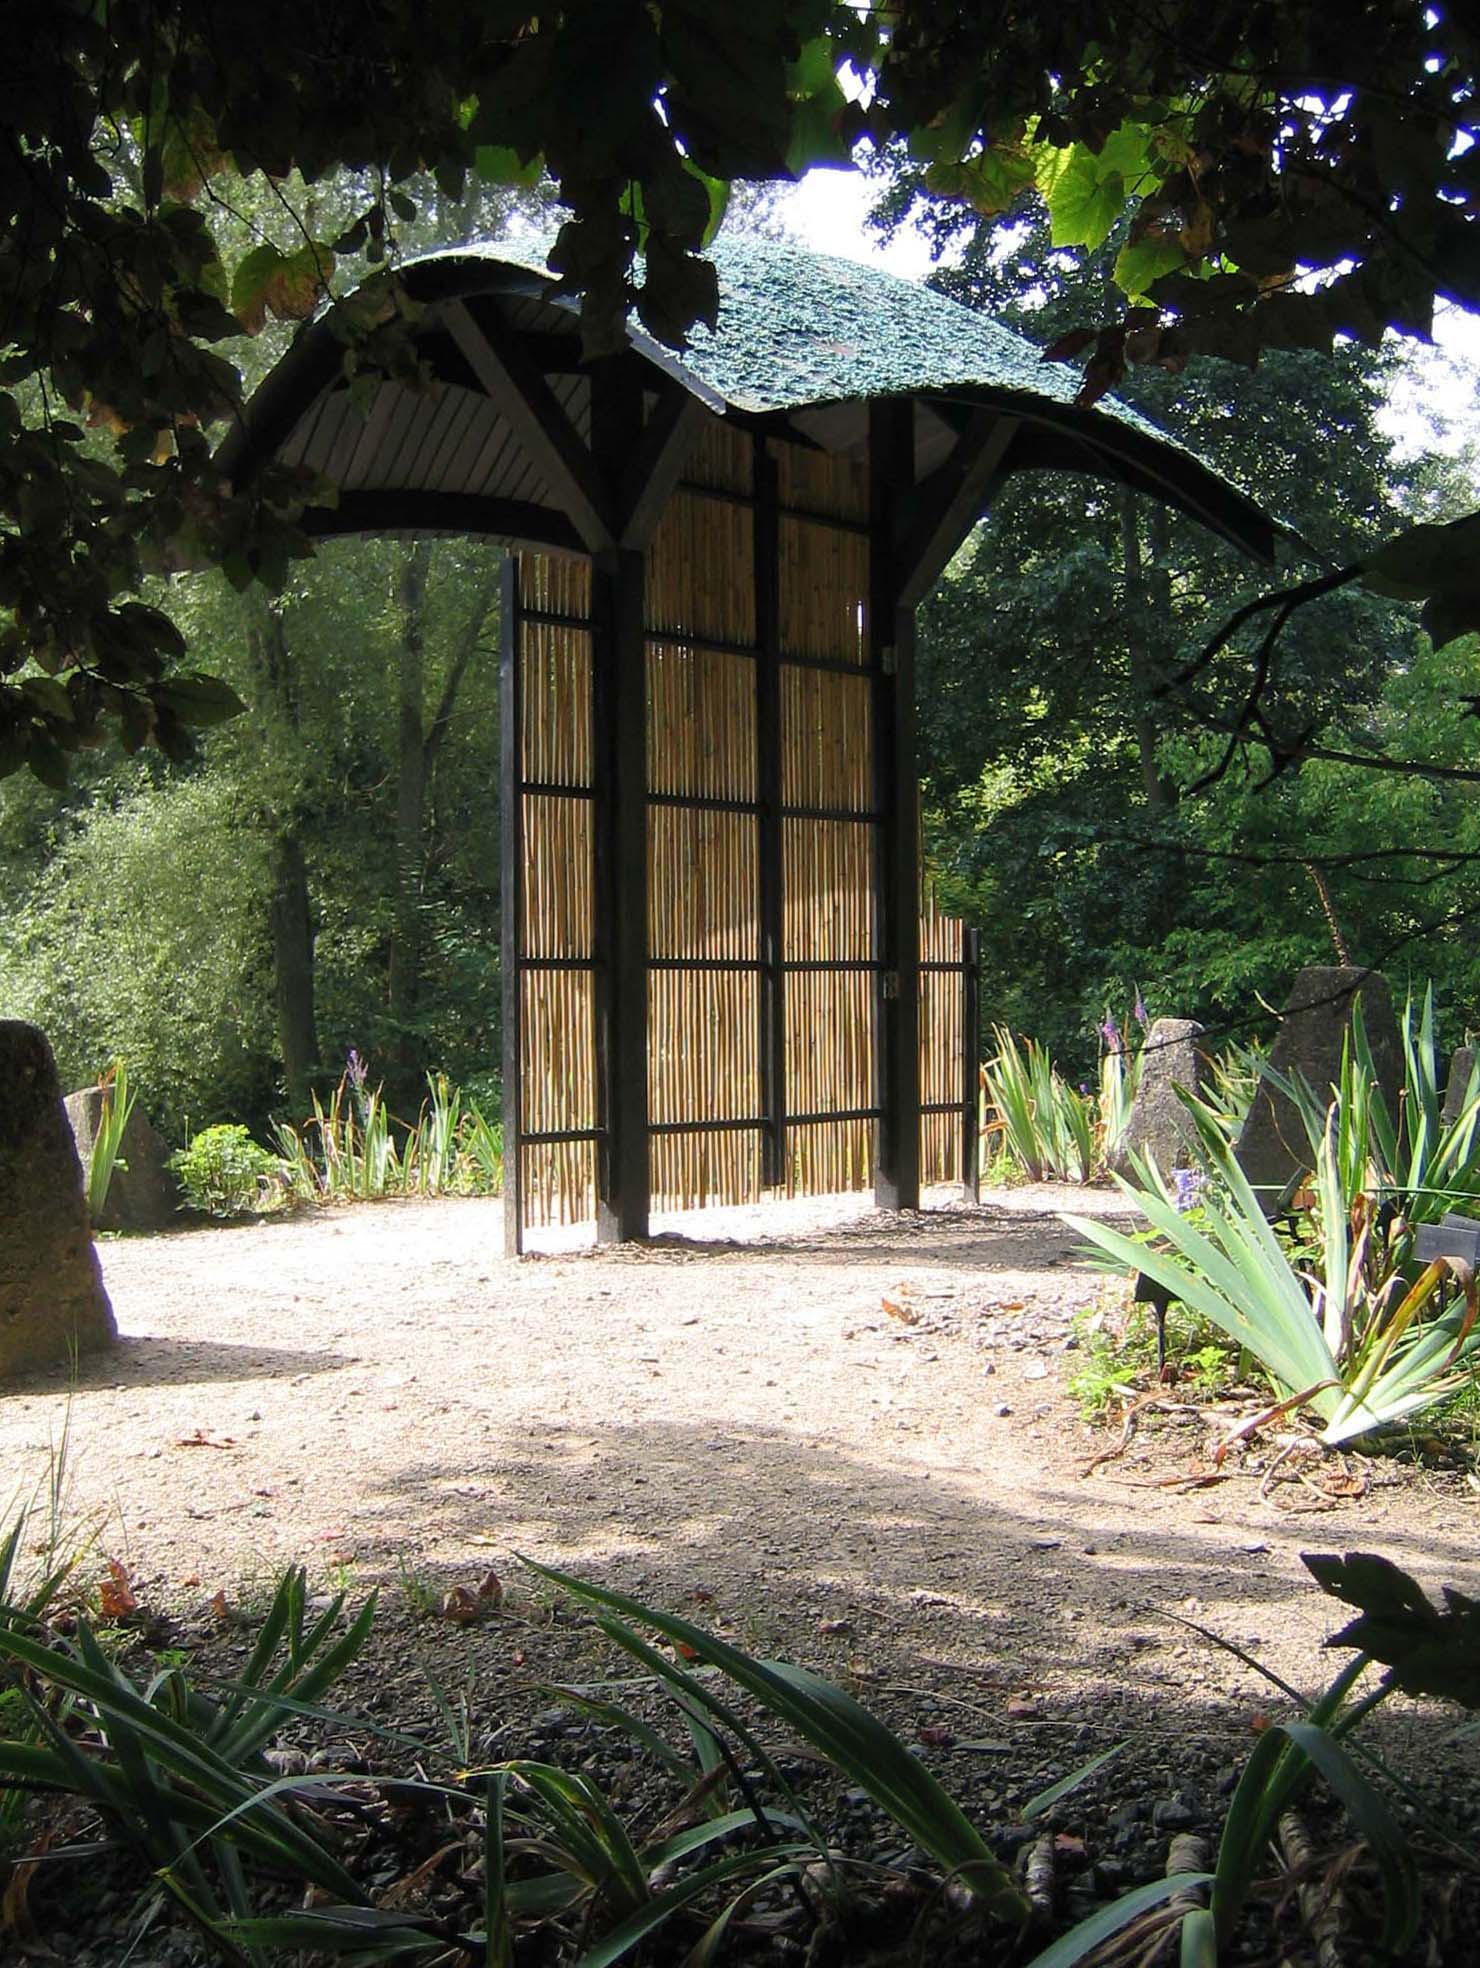 AMIGASAMON 2007. Abbey House Garden, Malmesbury. The home of the Naked Gardeners..jpg